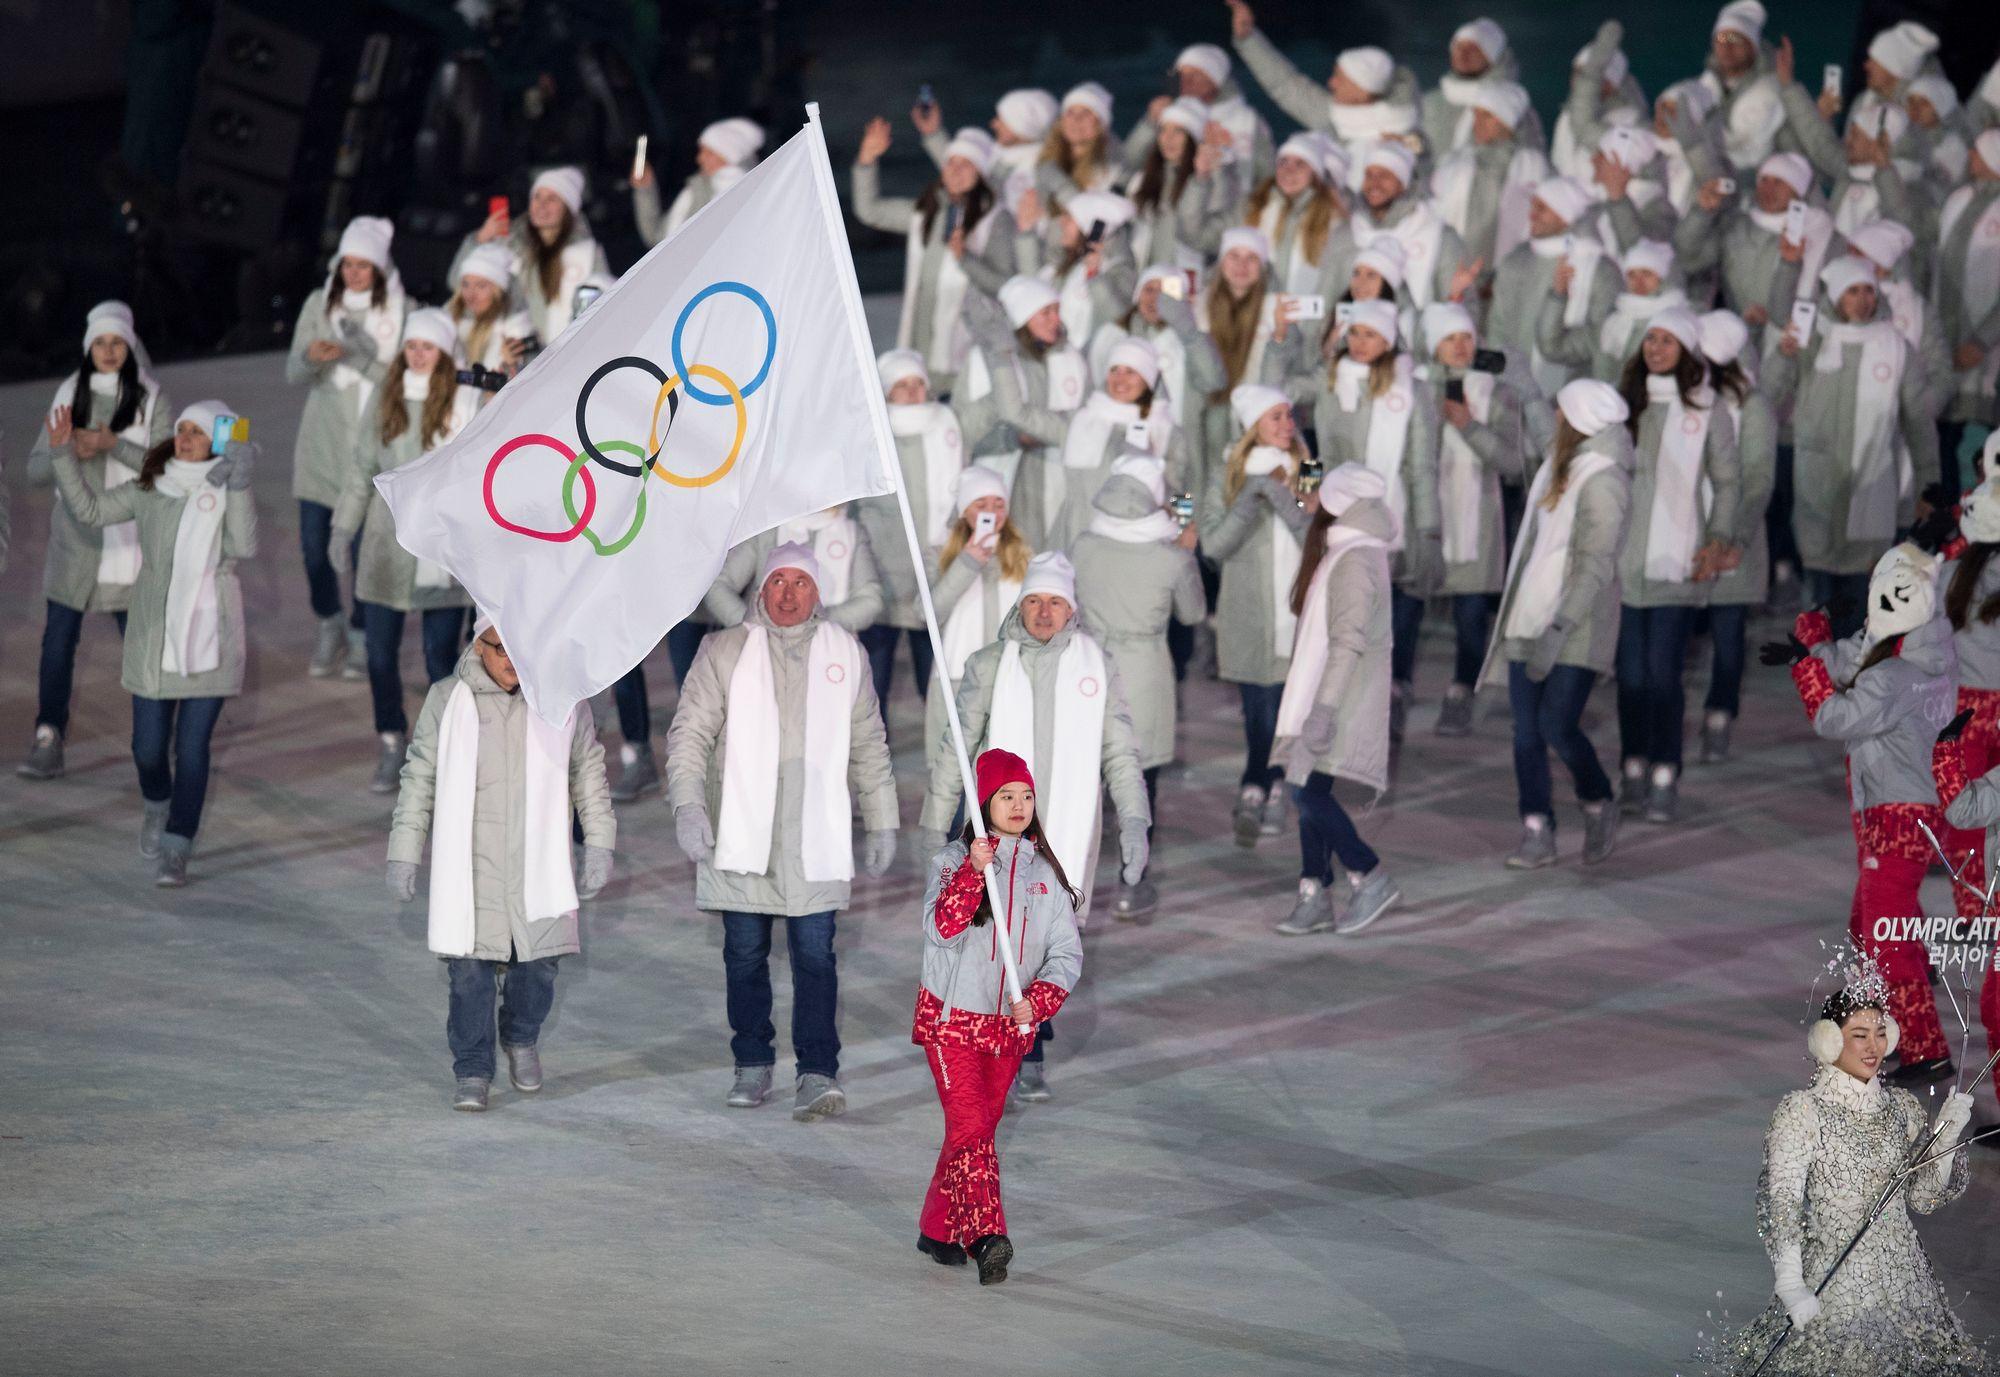 Le CIO lève la suspension de la Russie — Dopage étatique